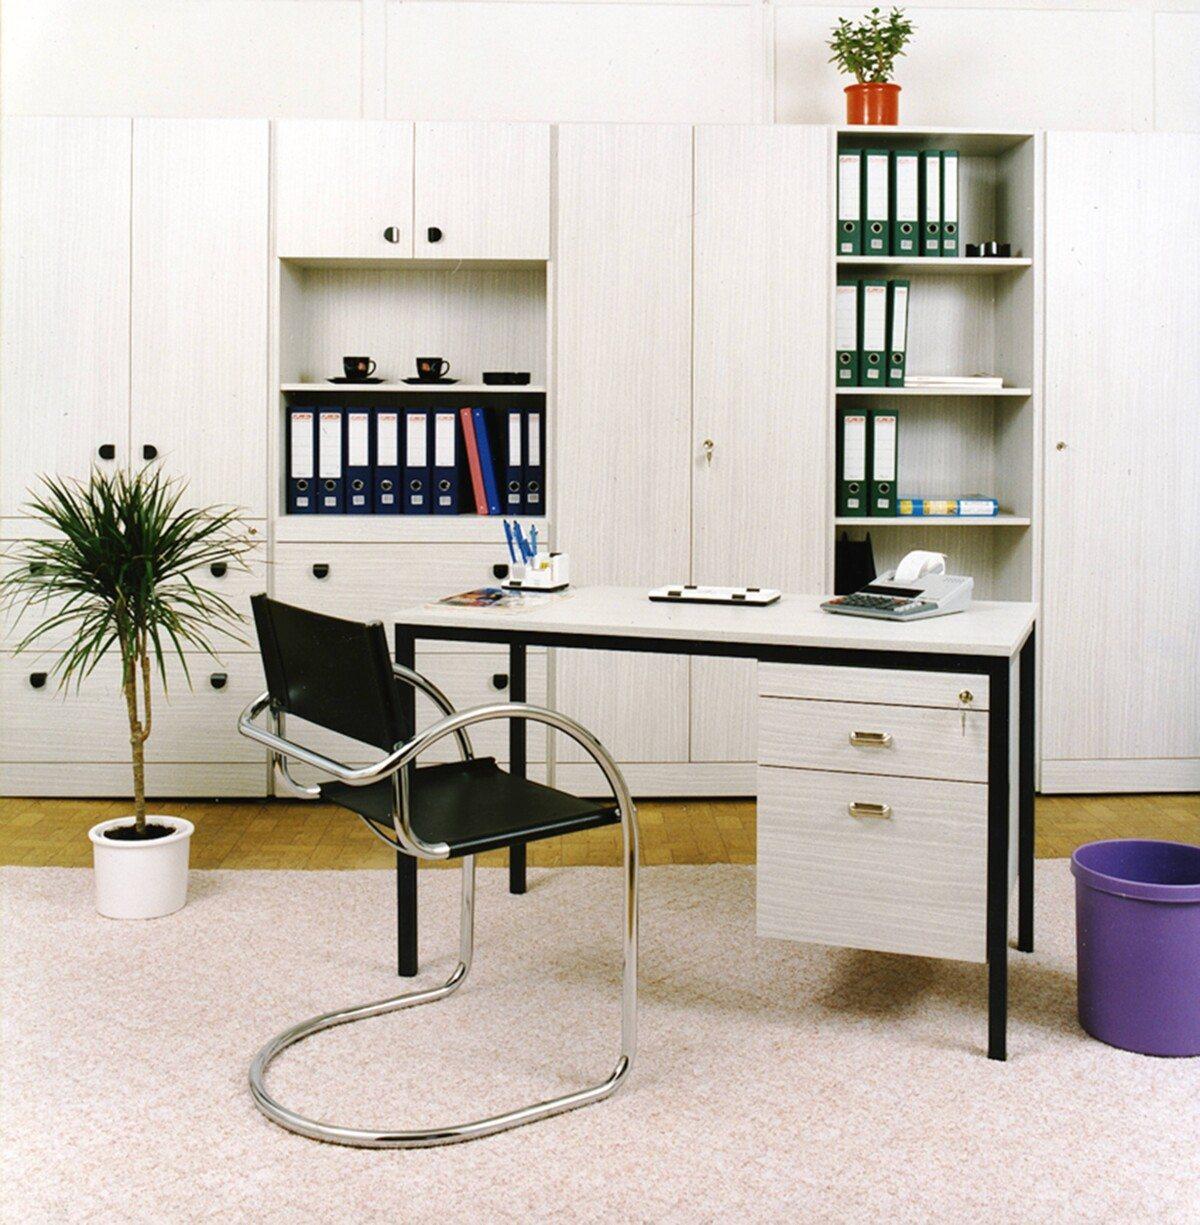 historie palmberg b roeinrichtungen service gmbh. Black Bedroom Furniture Sets. Home Design Ideas